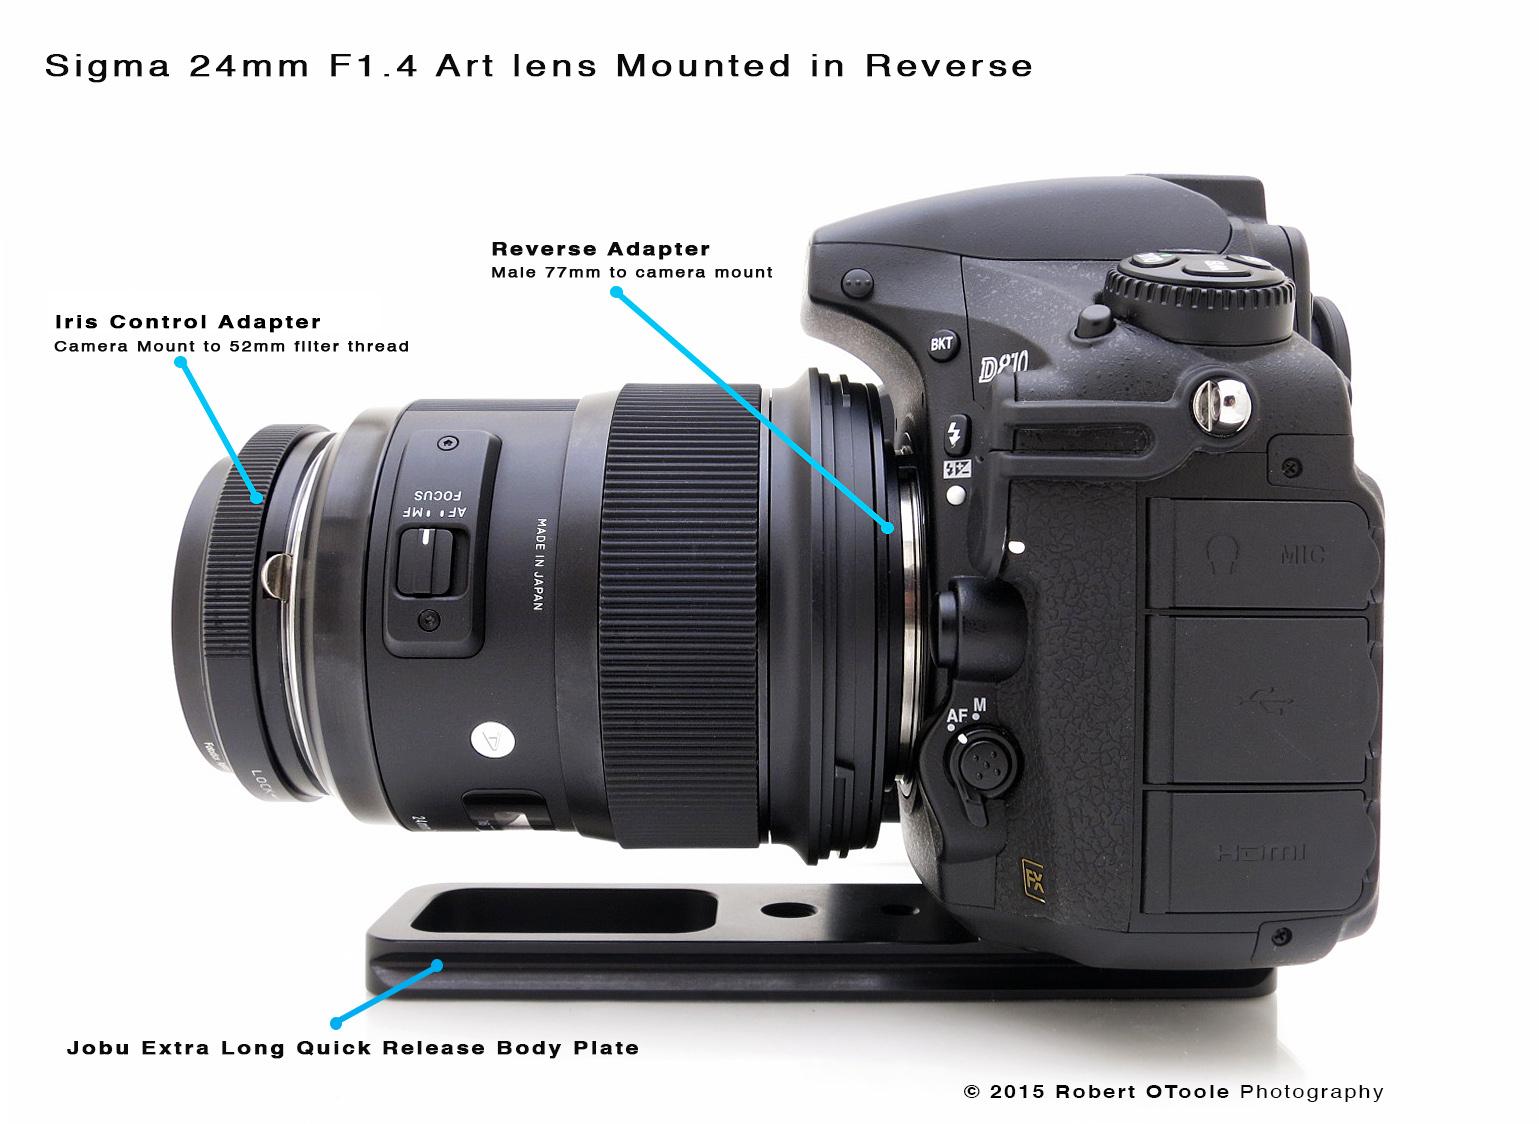 Sigma-24mm-Art-Lens-Adapters-Robert-OToole-Photography-2016